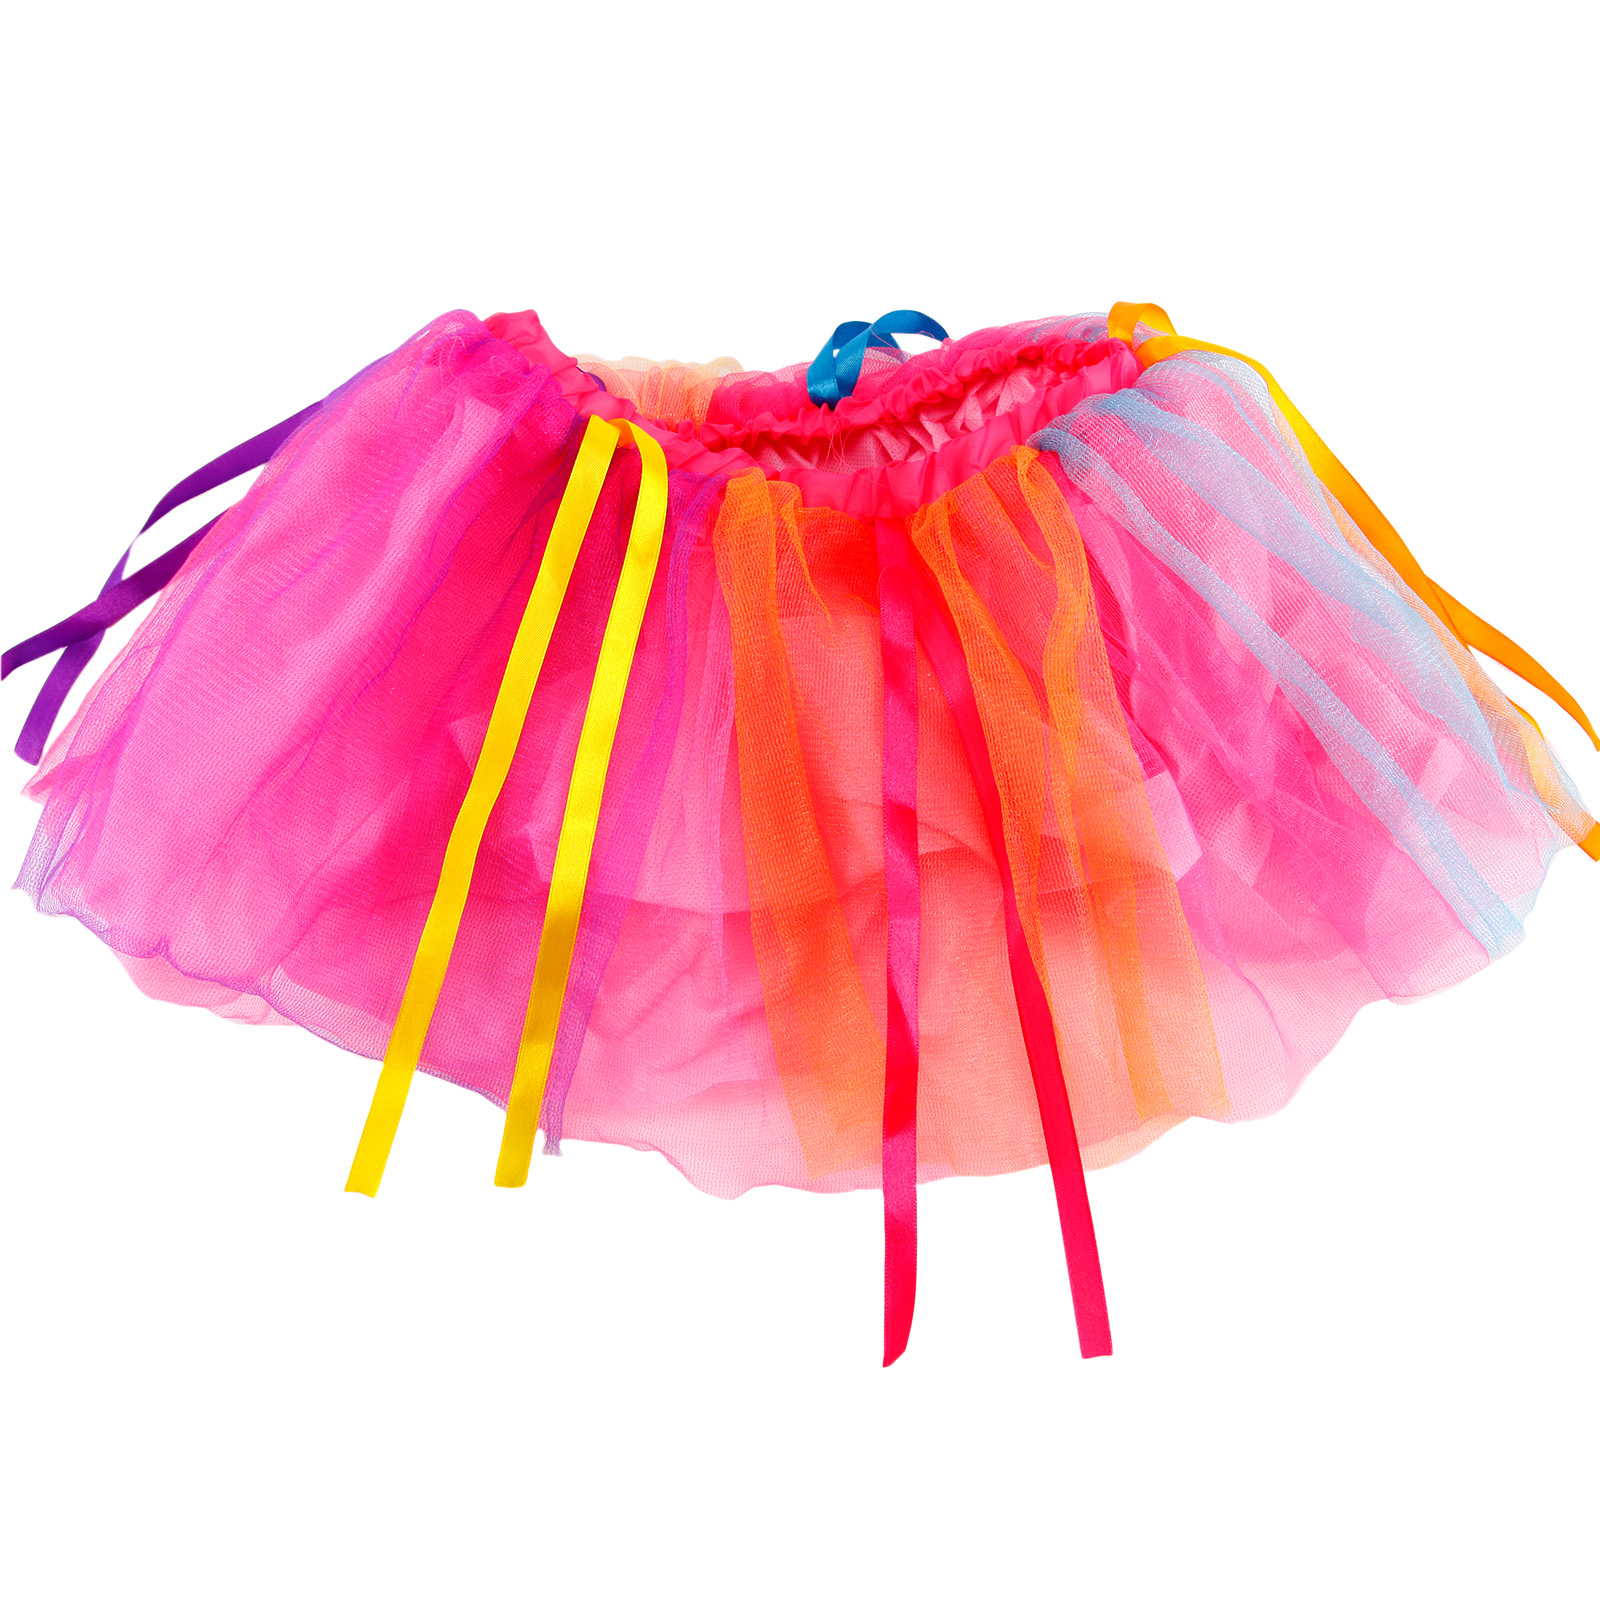 ad0436760 80s rainbow Tutu Skirt Girl Kids Petticoat Fancy Dress han party   eBay